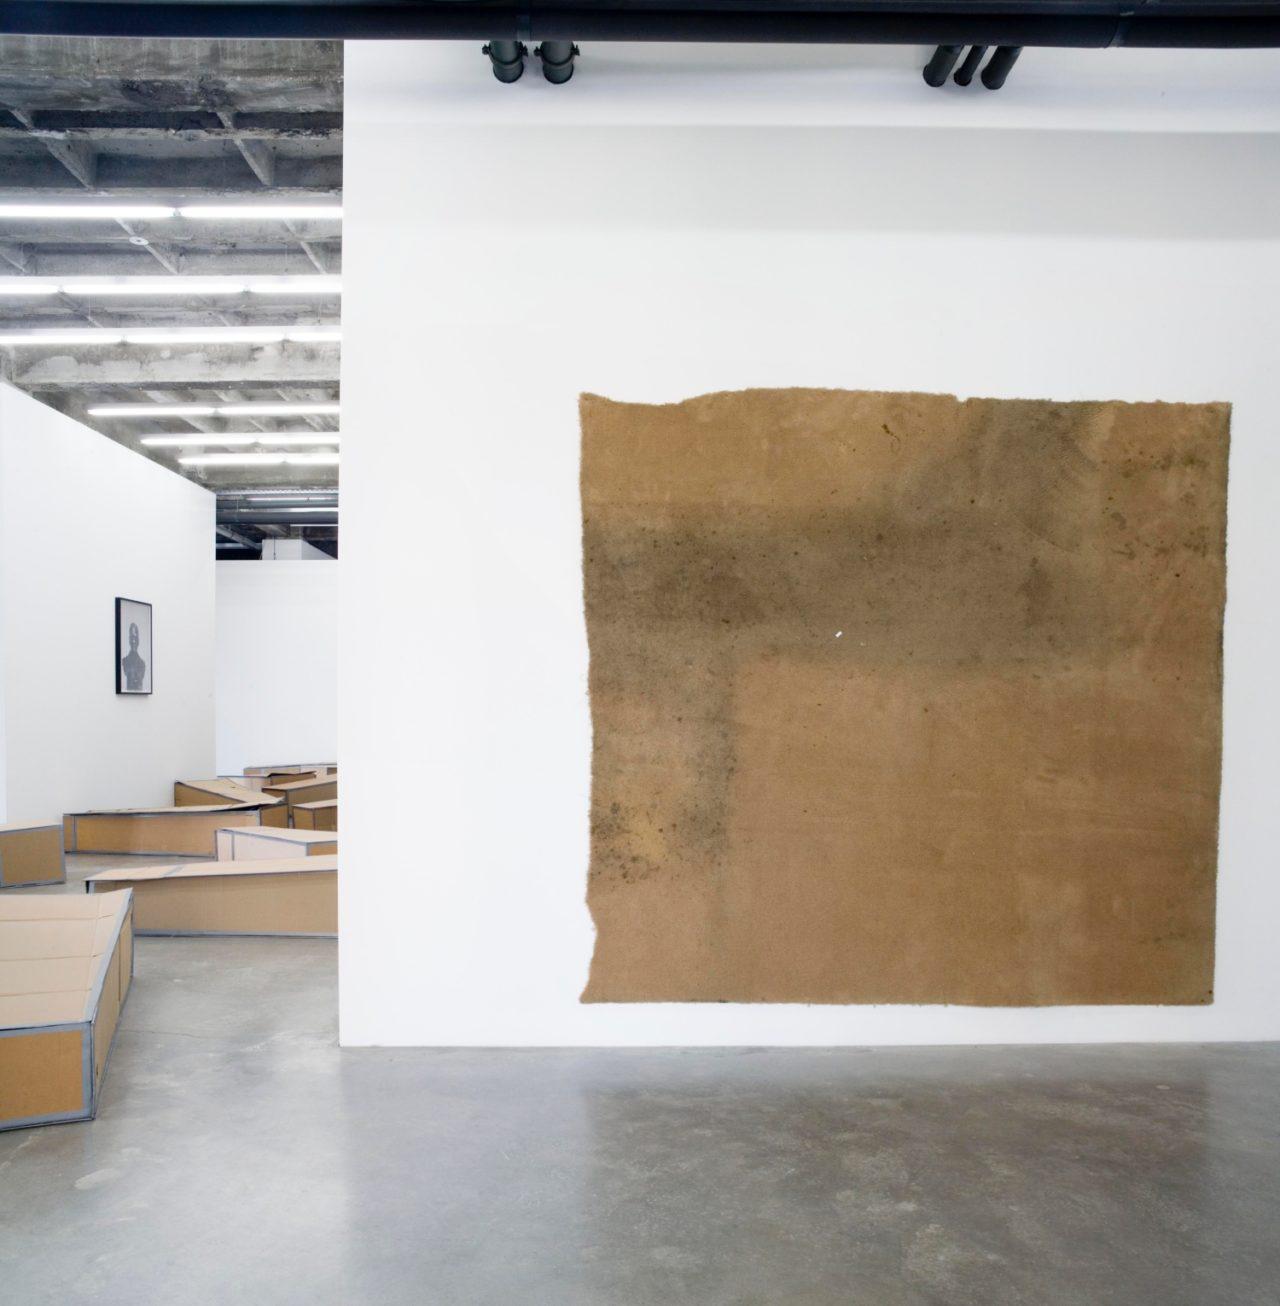 Rodney McMillian, Installation view